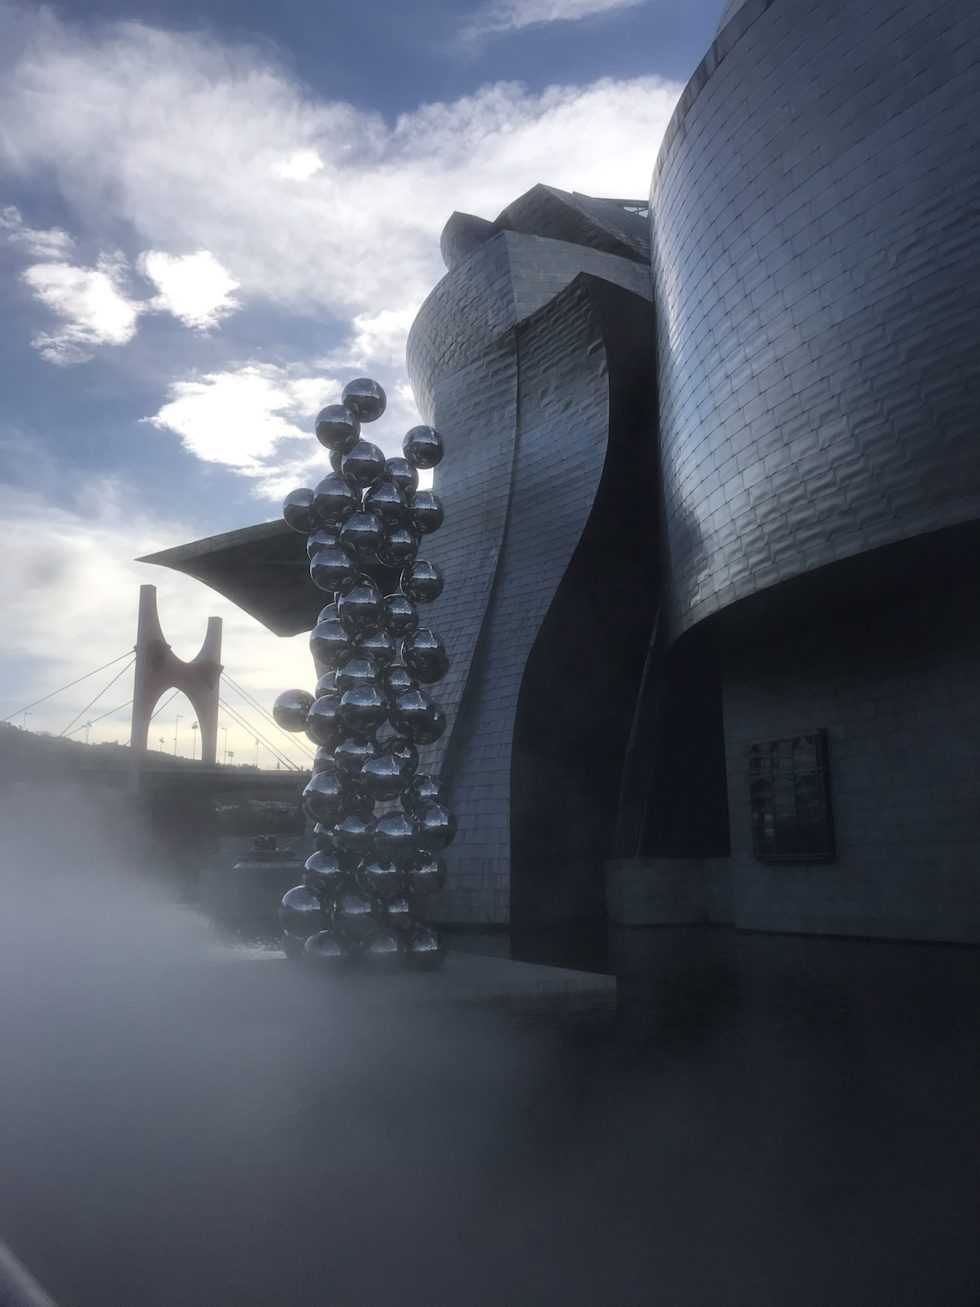 Guggenheim Bilbao, Kategorie Abstrakt, #fopanet Fotoparade